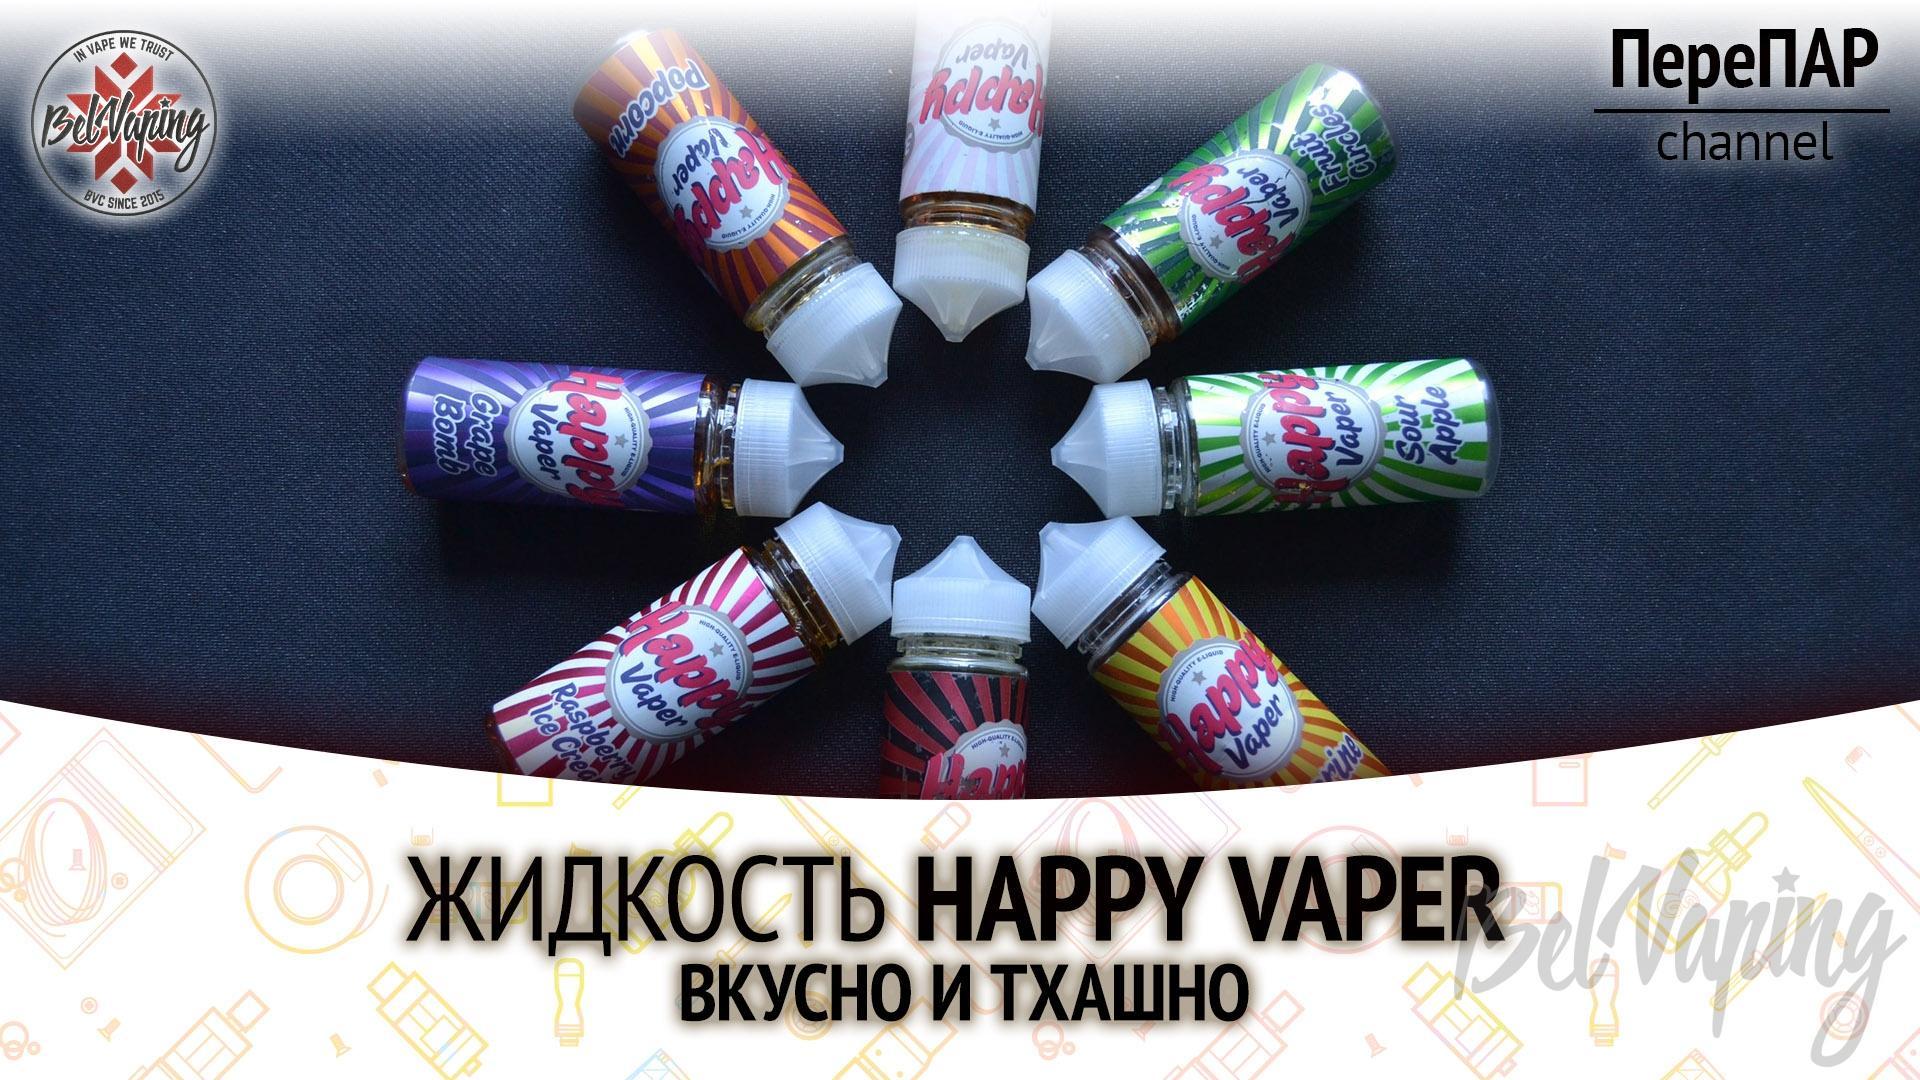 Обзор жидкости для вейпинга Happy Vaper